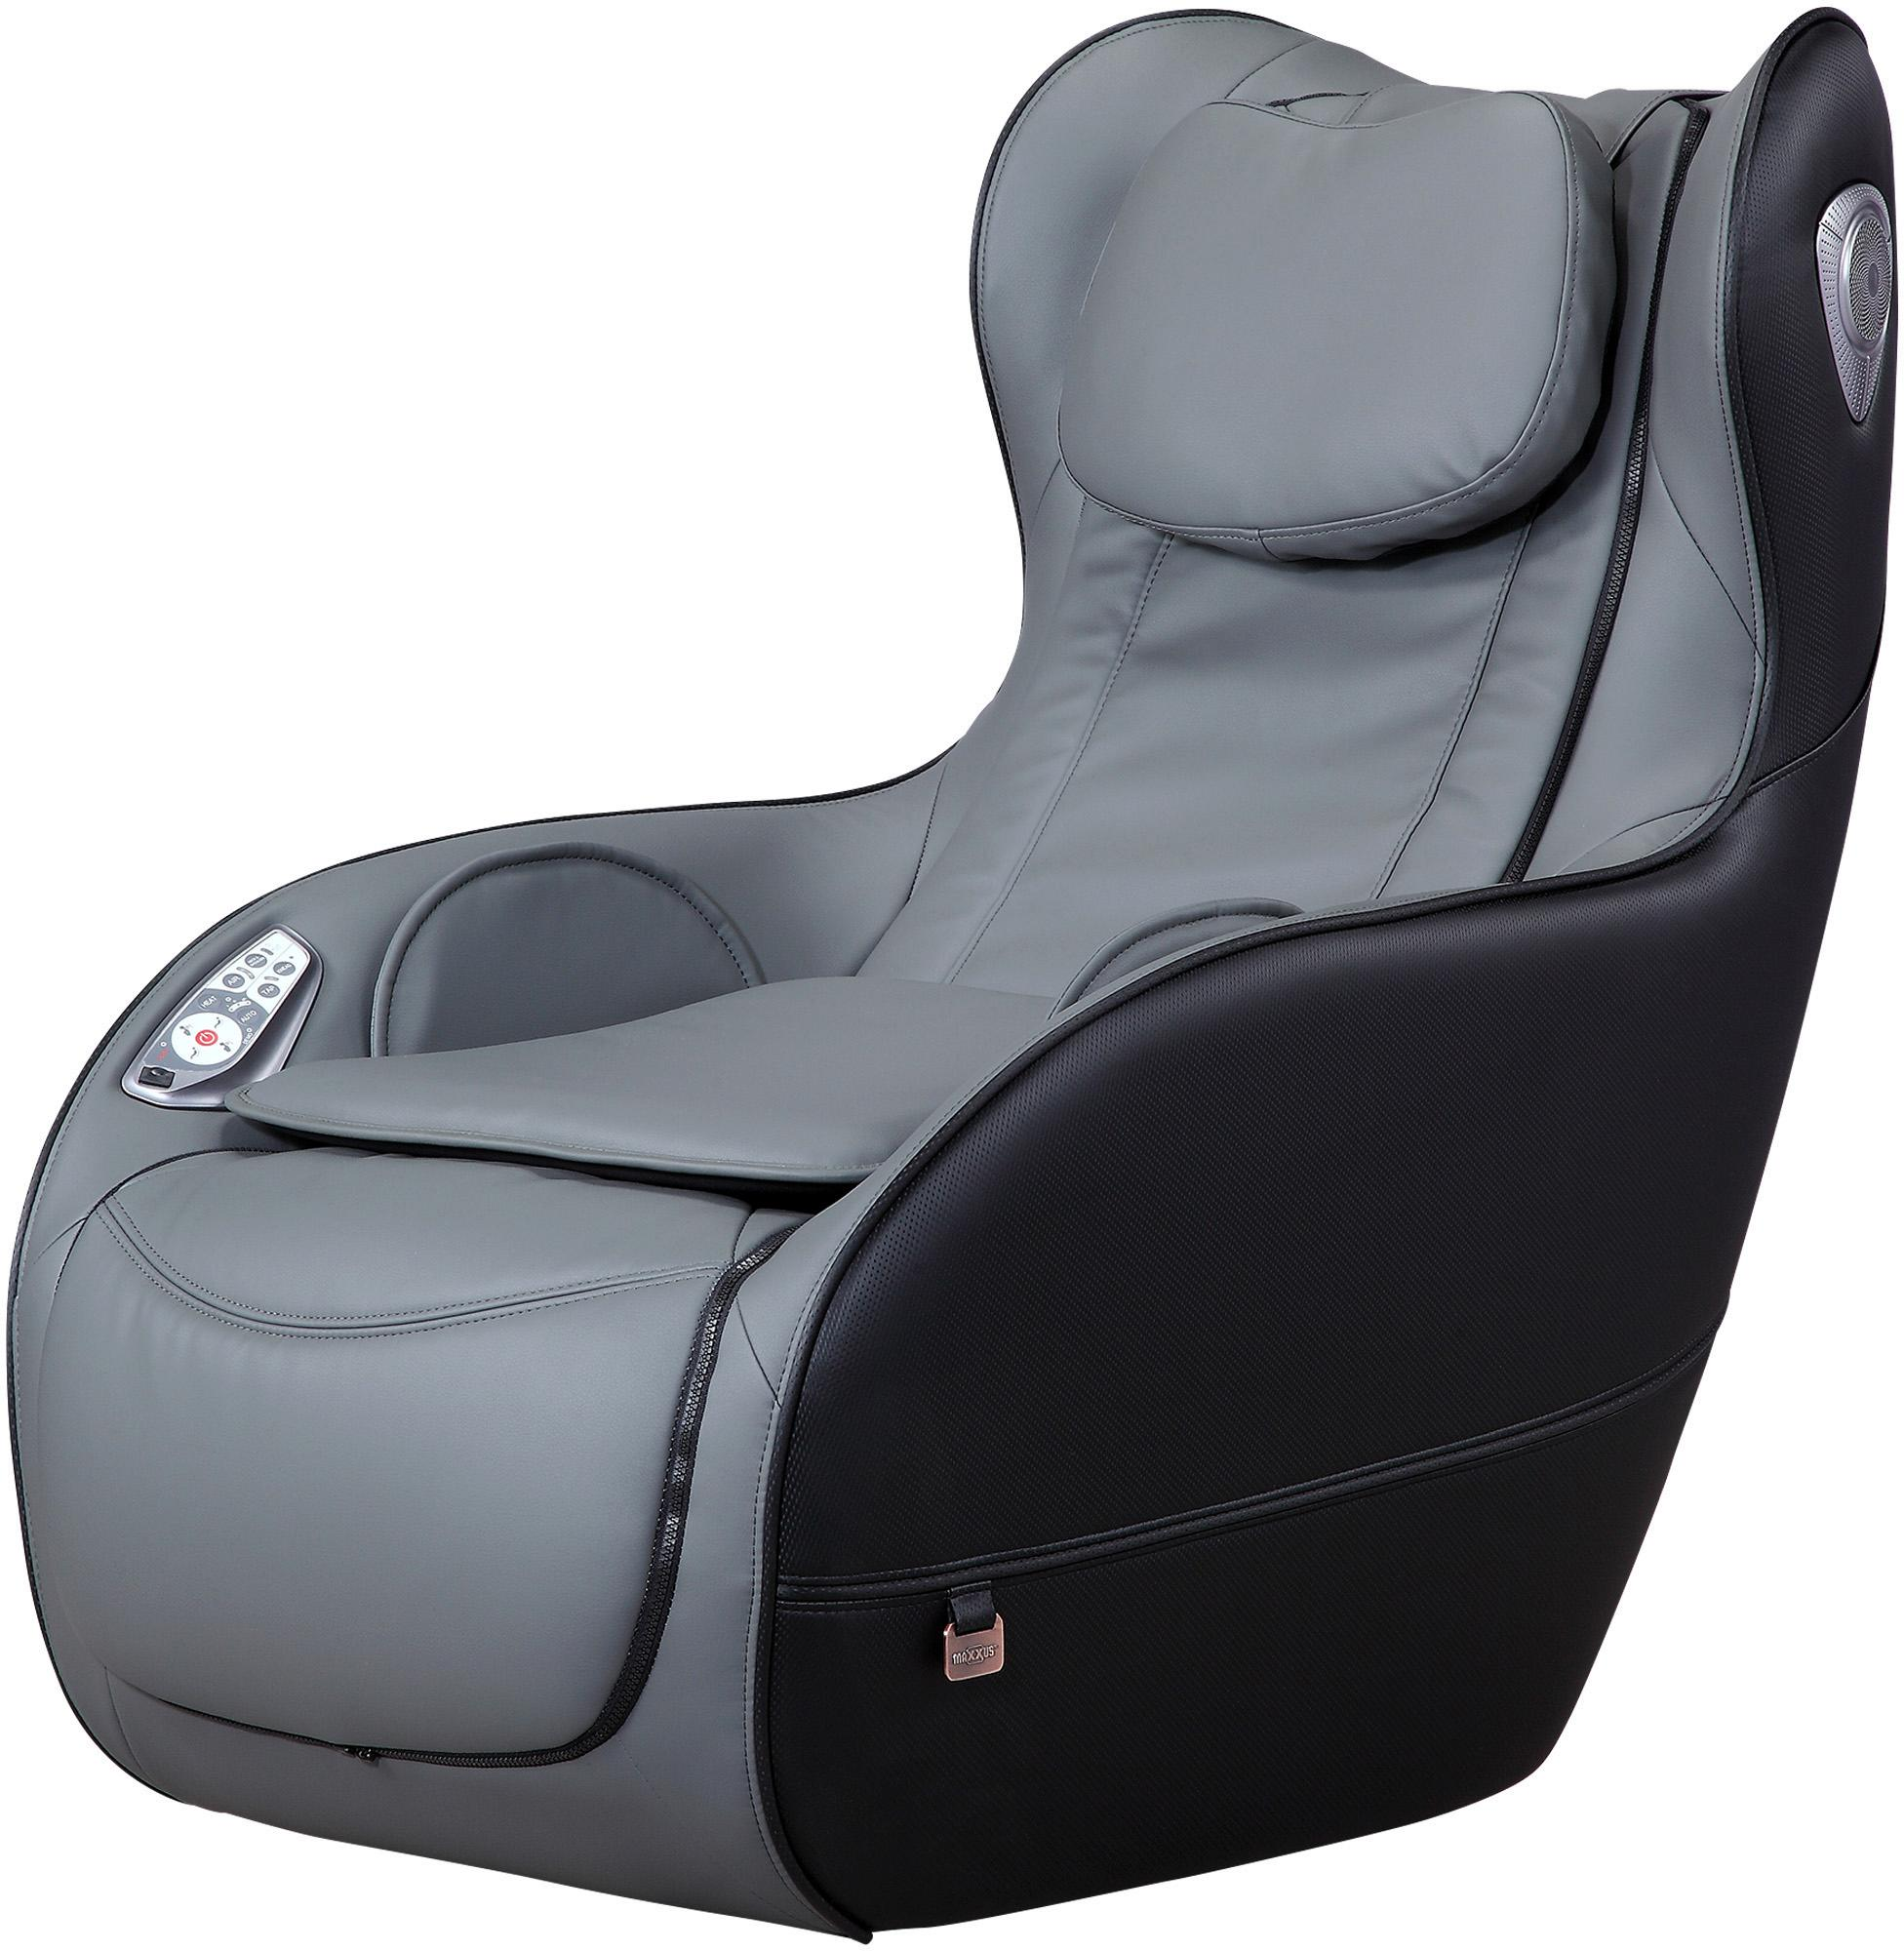 MAXXUS Massagesessel MX 7.1 grau Sessel